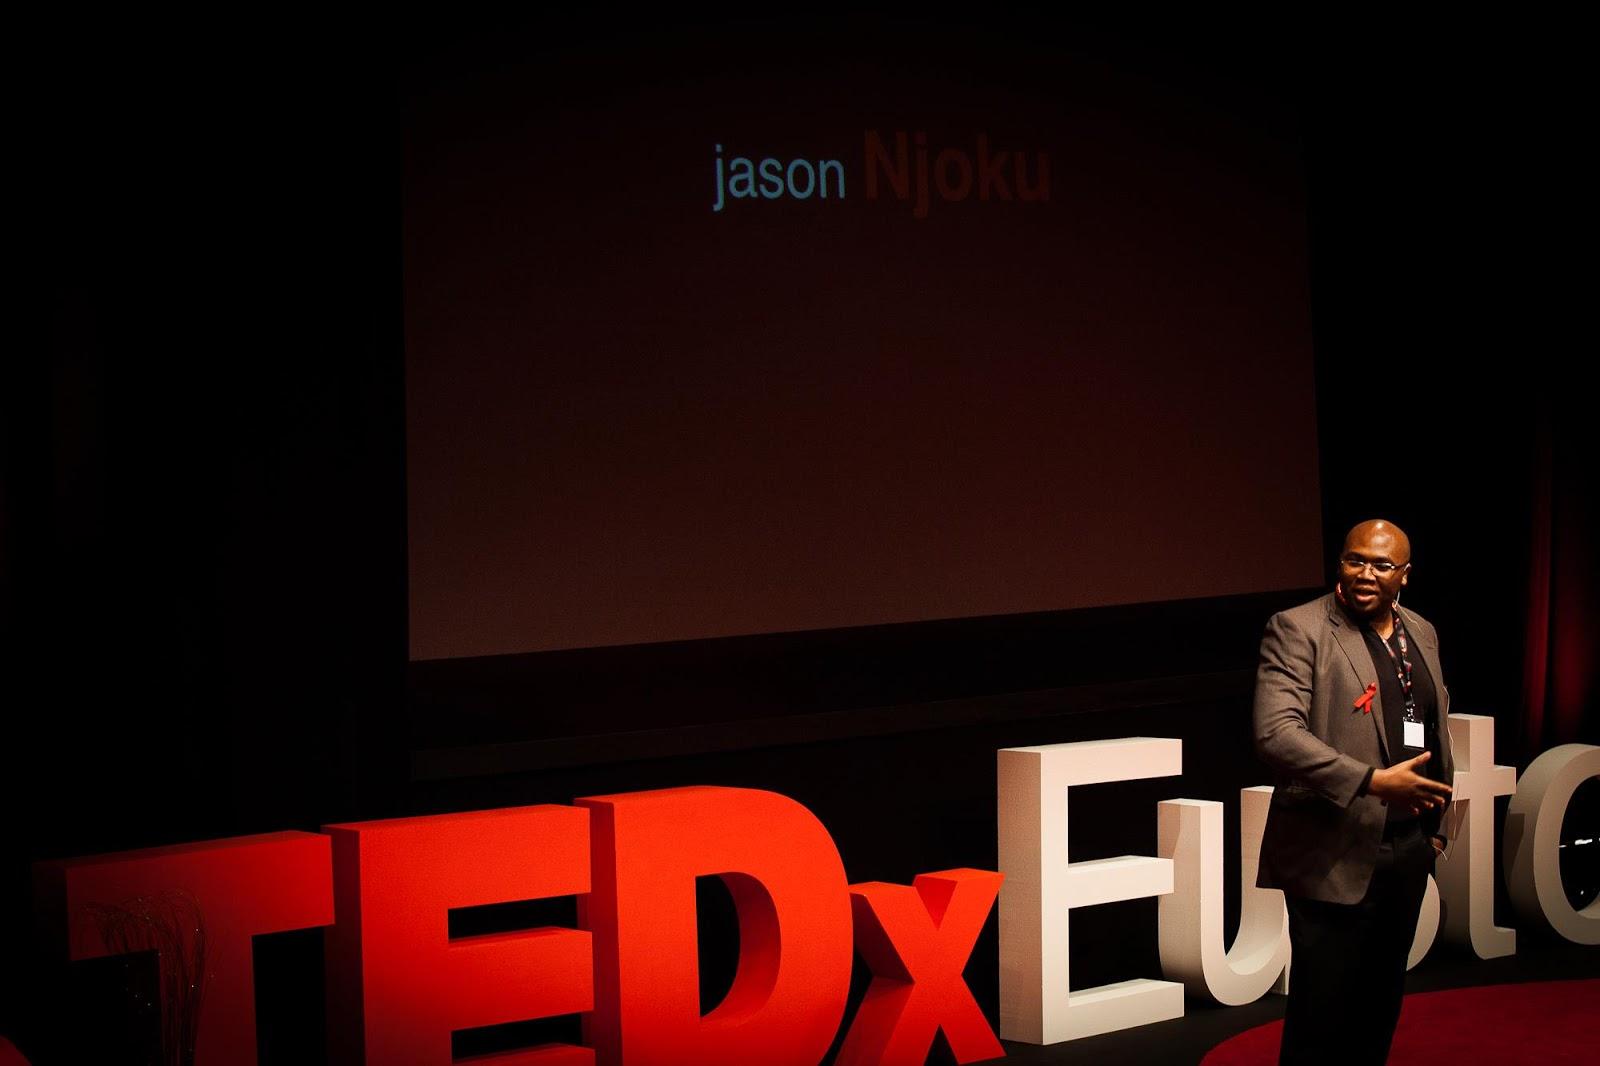 Inspiration Tuesday! Failing all the way to success Jason Njoku on TedxEuston